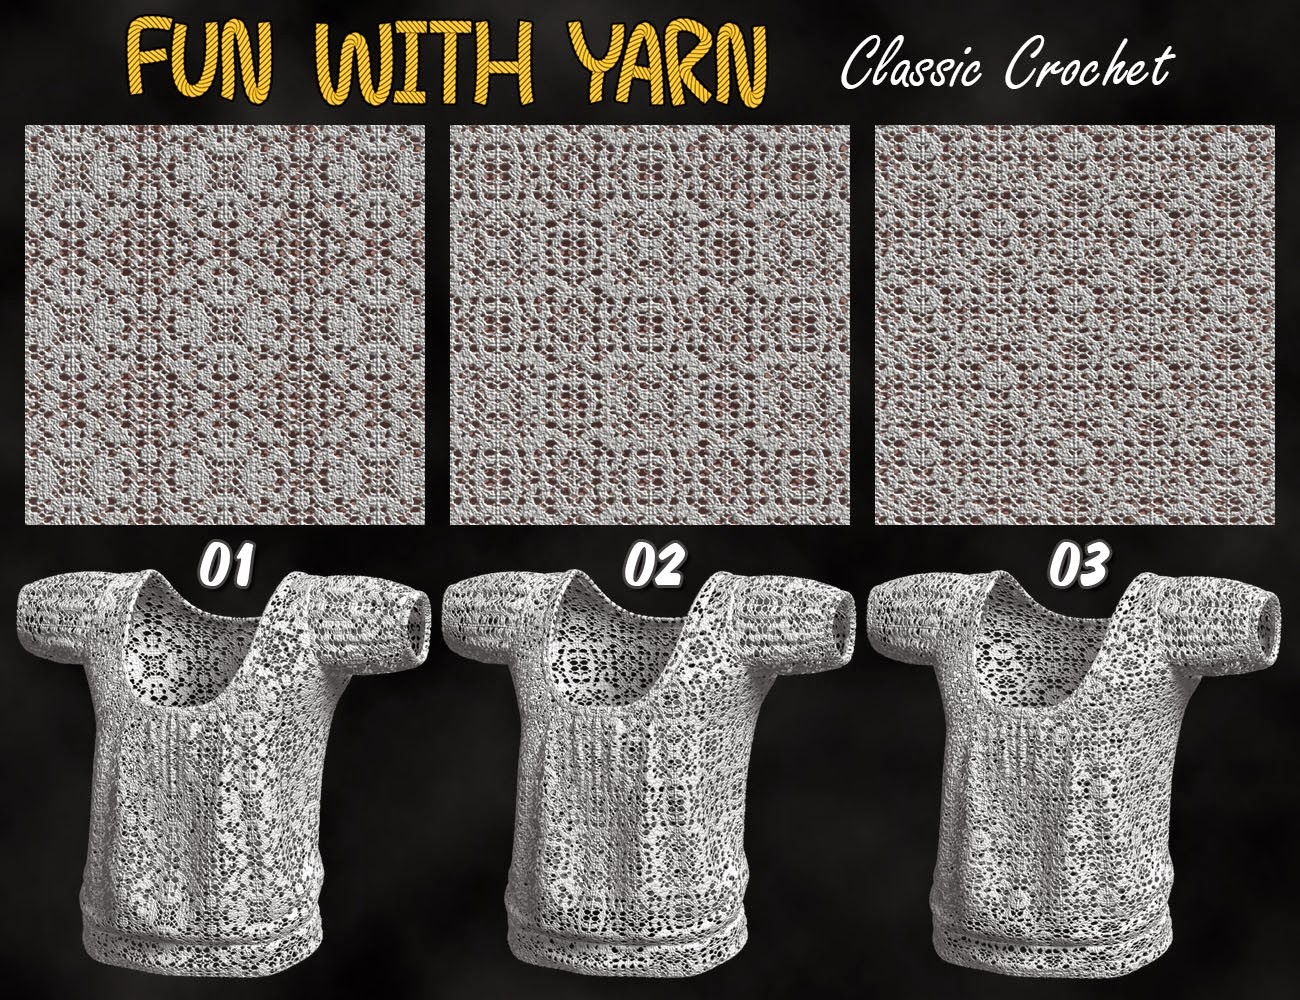 Fun With Fils - Crochet classique